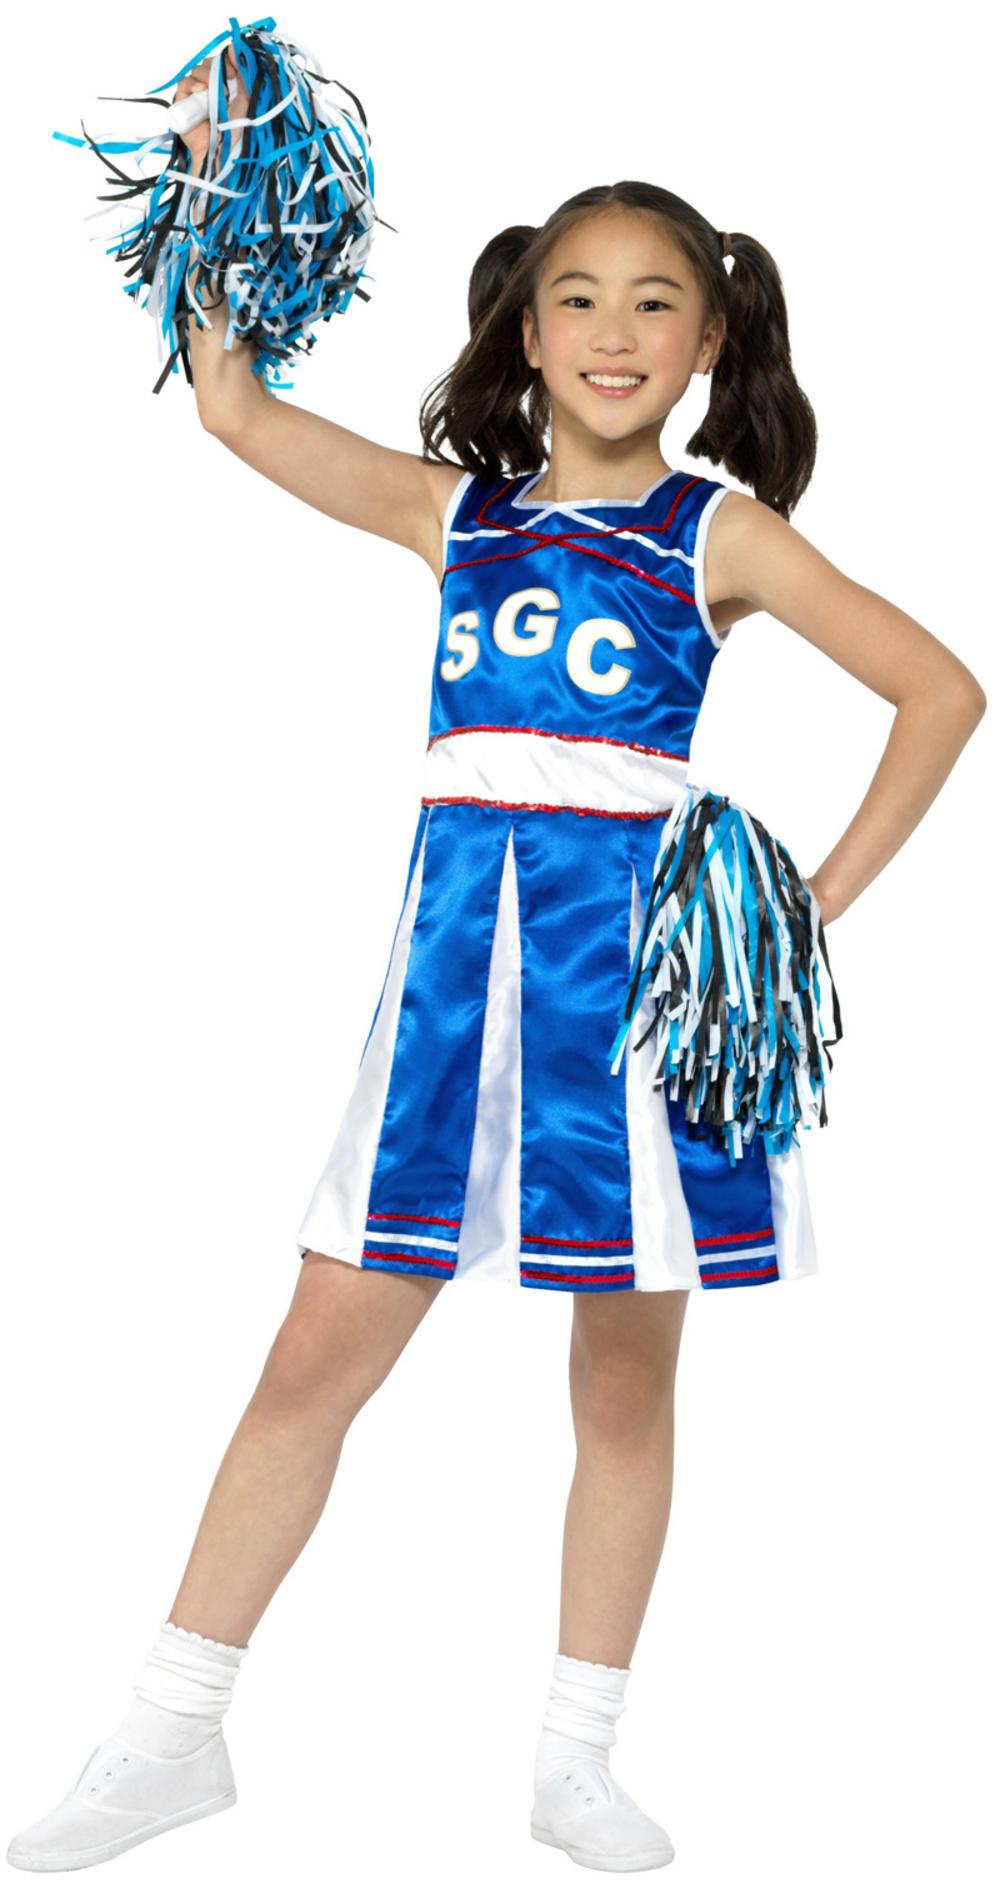 Blue Cheerleader Costume